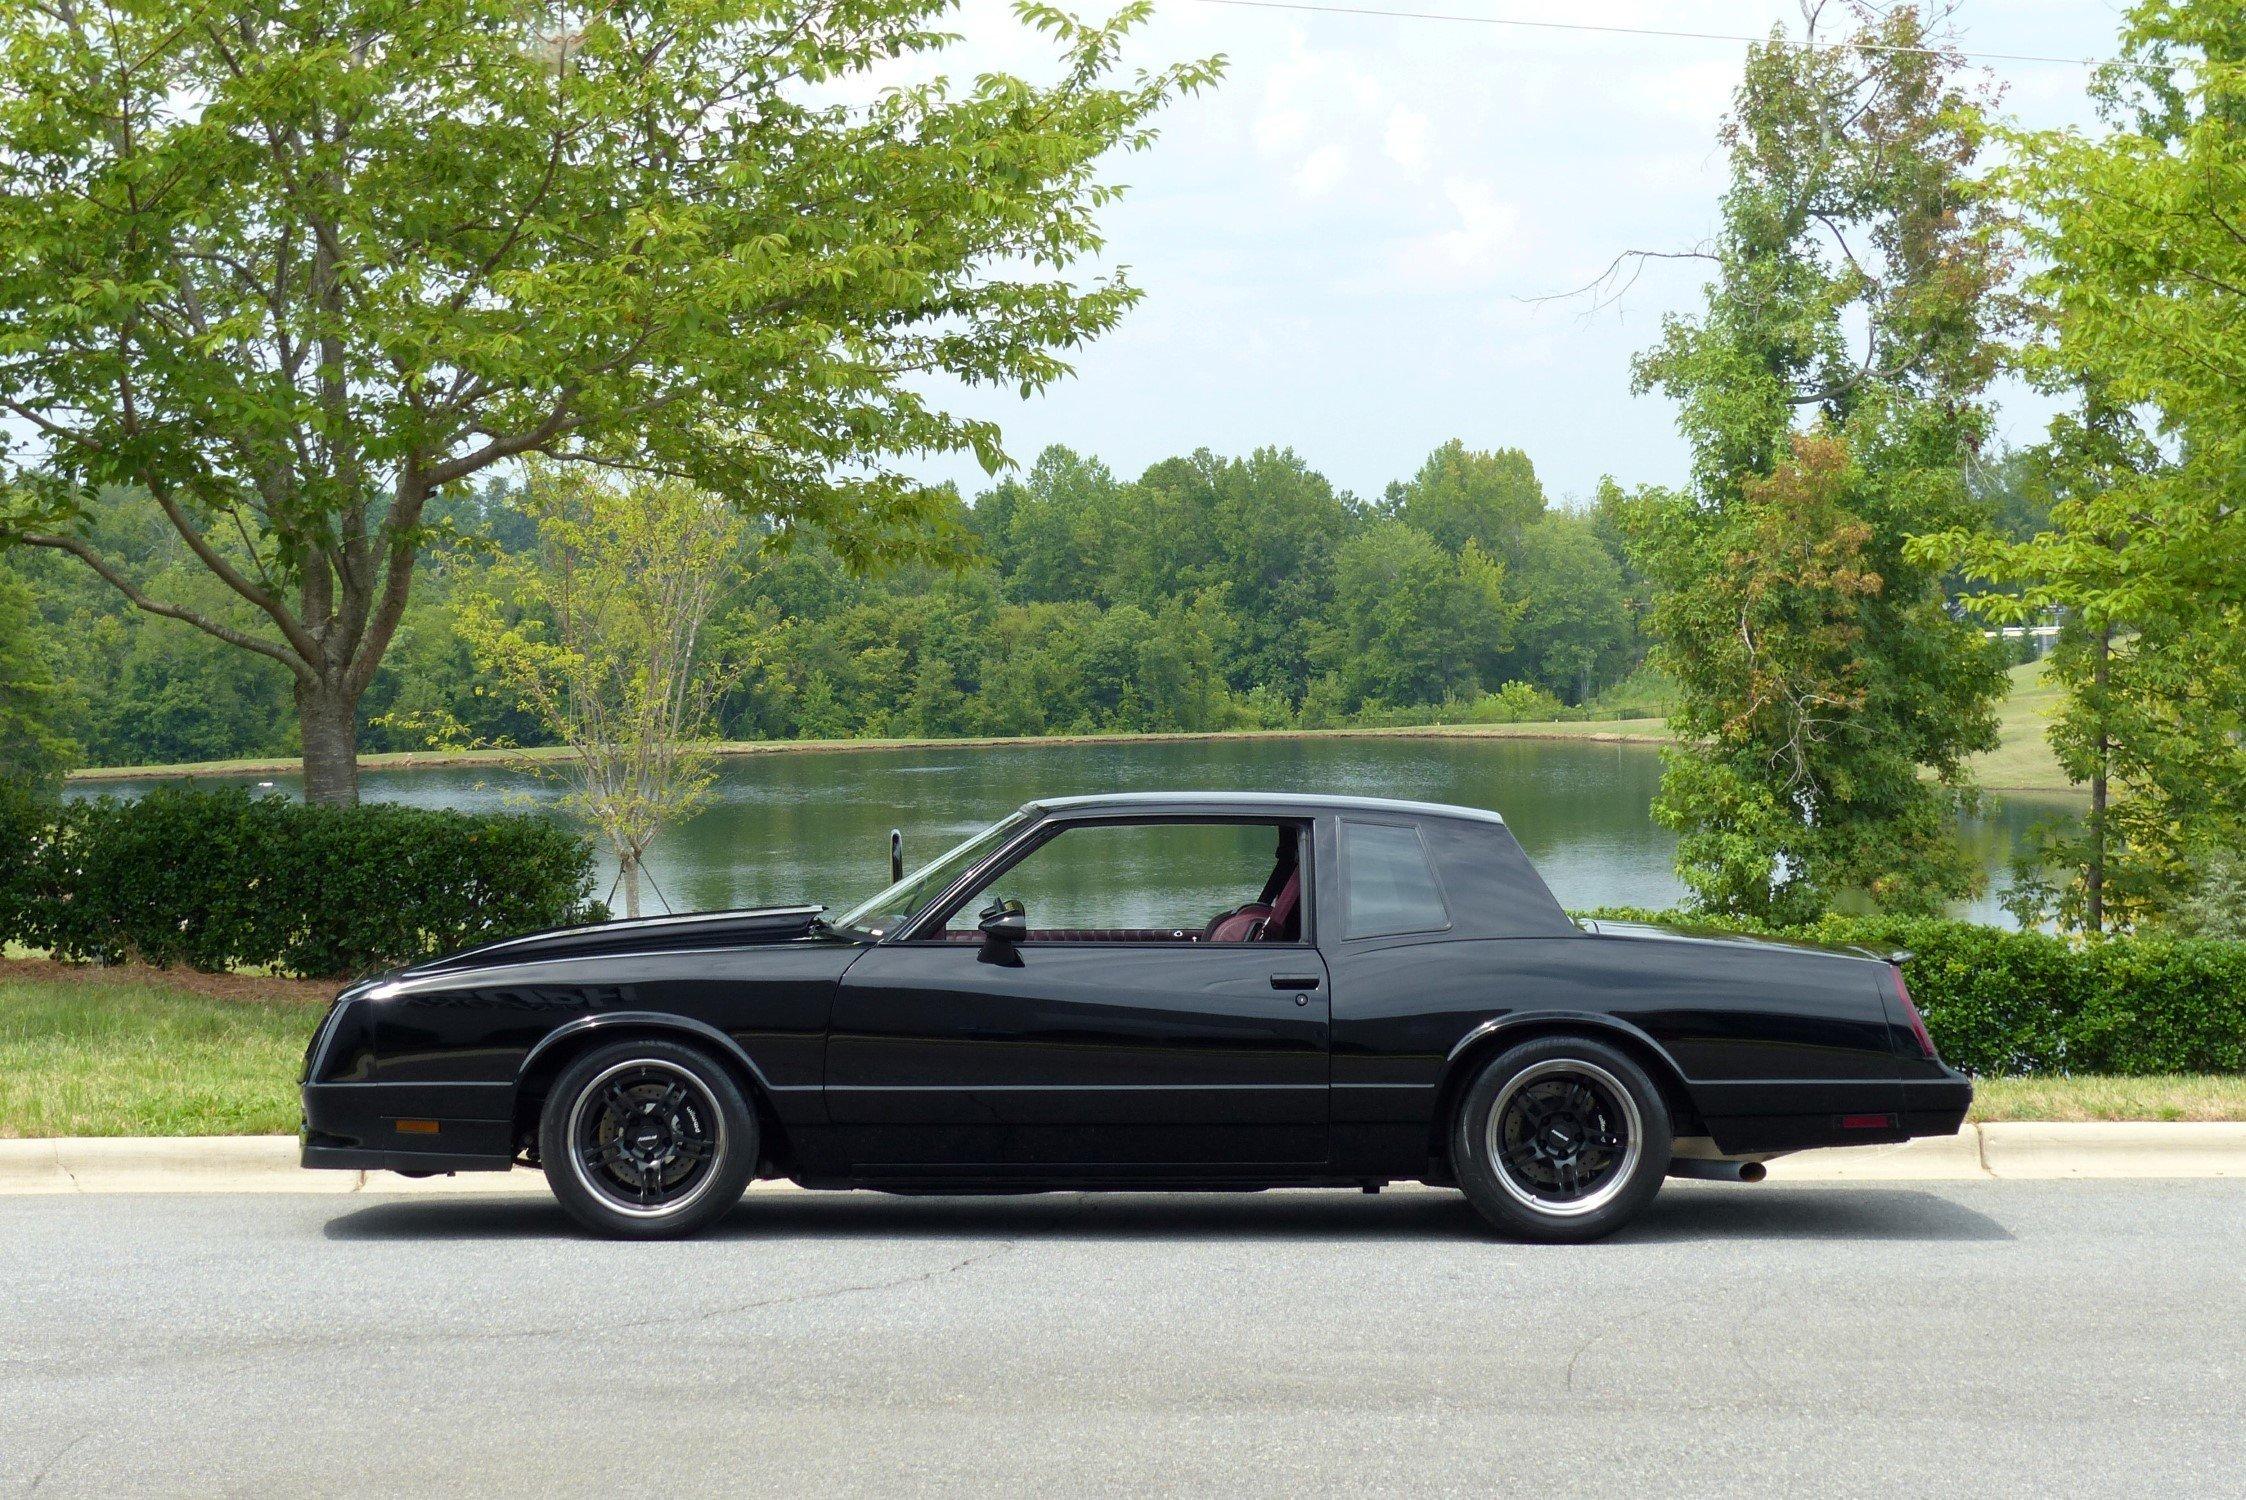 1985 Chevrolet Monte Carlo | GAA Classic Cars